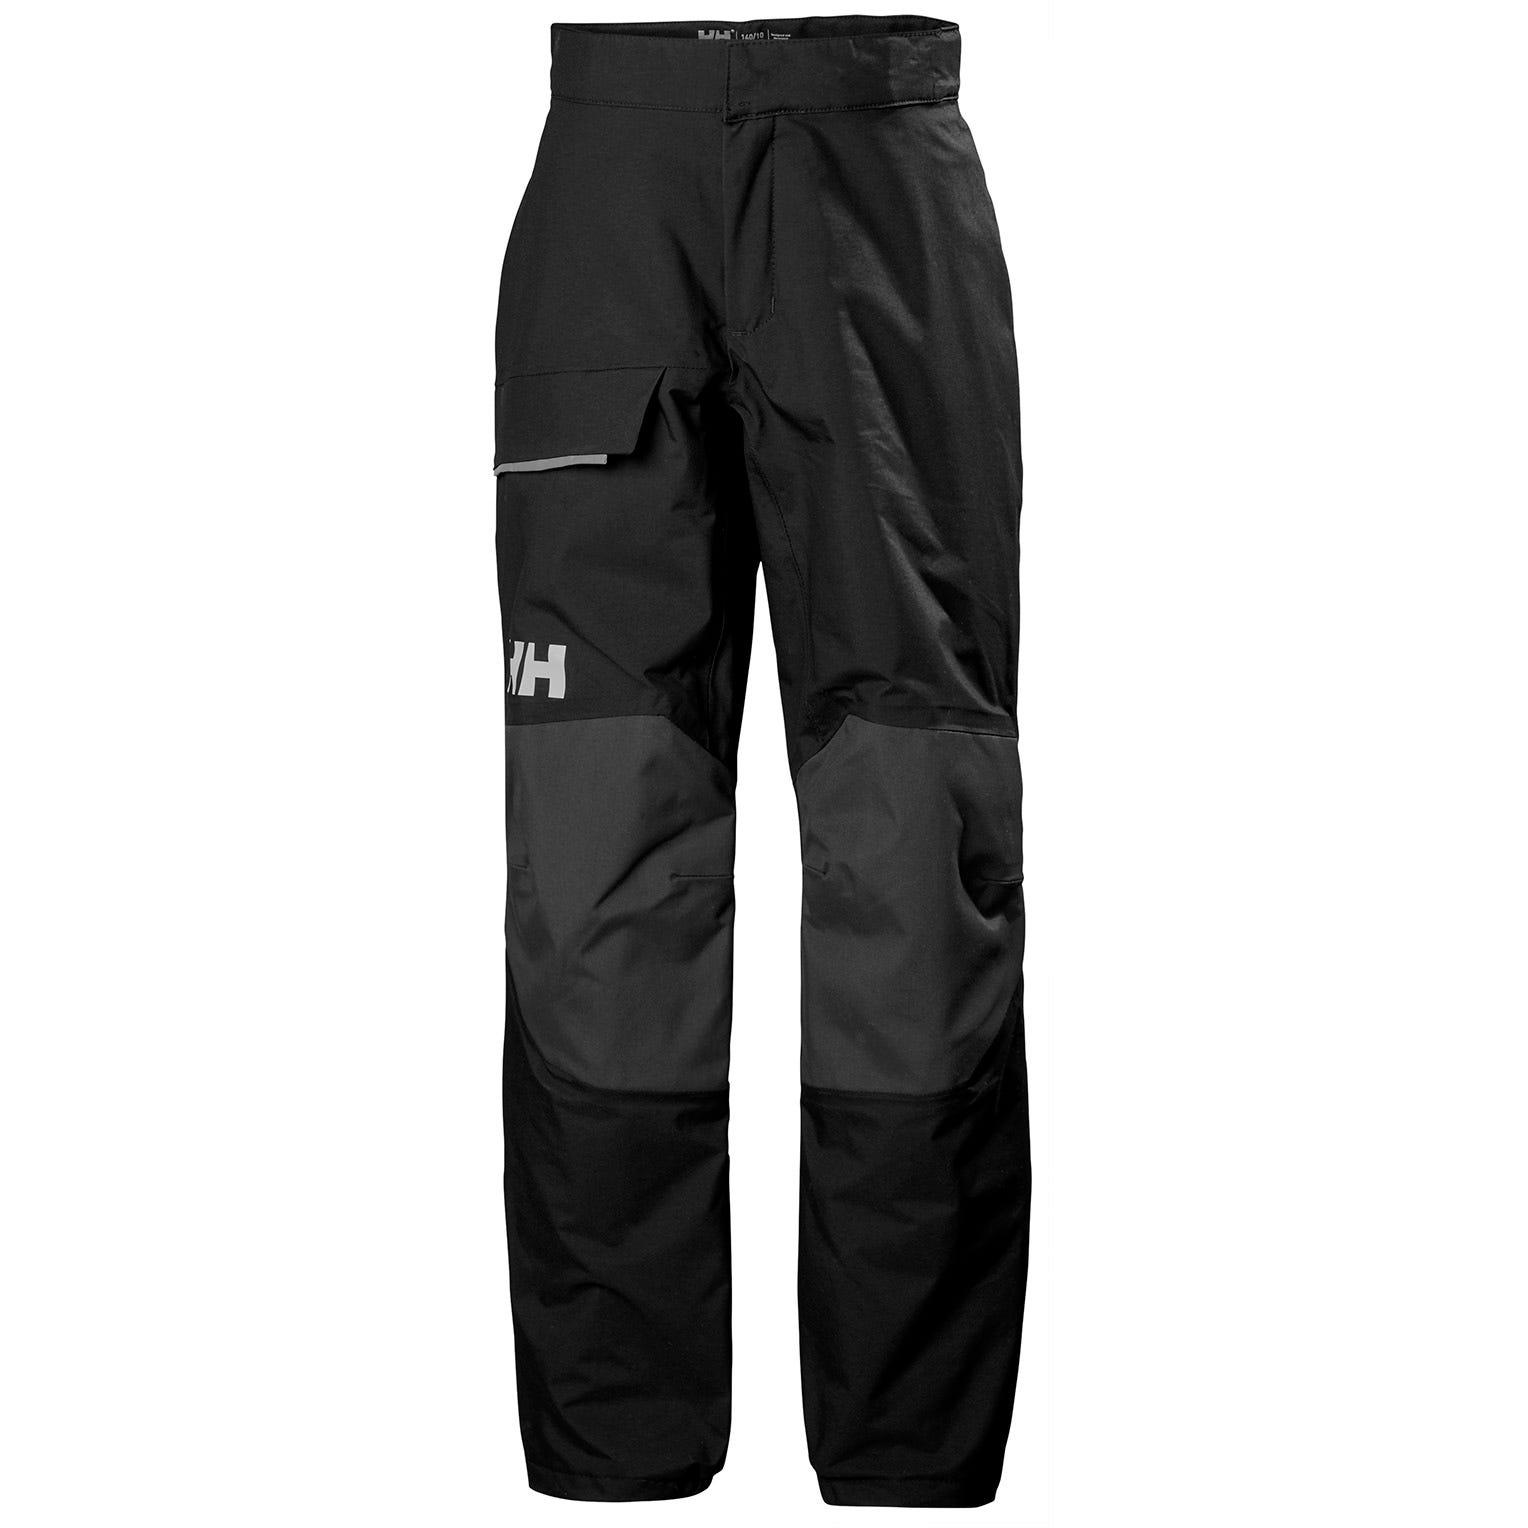 Helly Hansen Junior Border Pant Kids Black 176/16